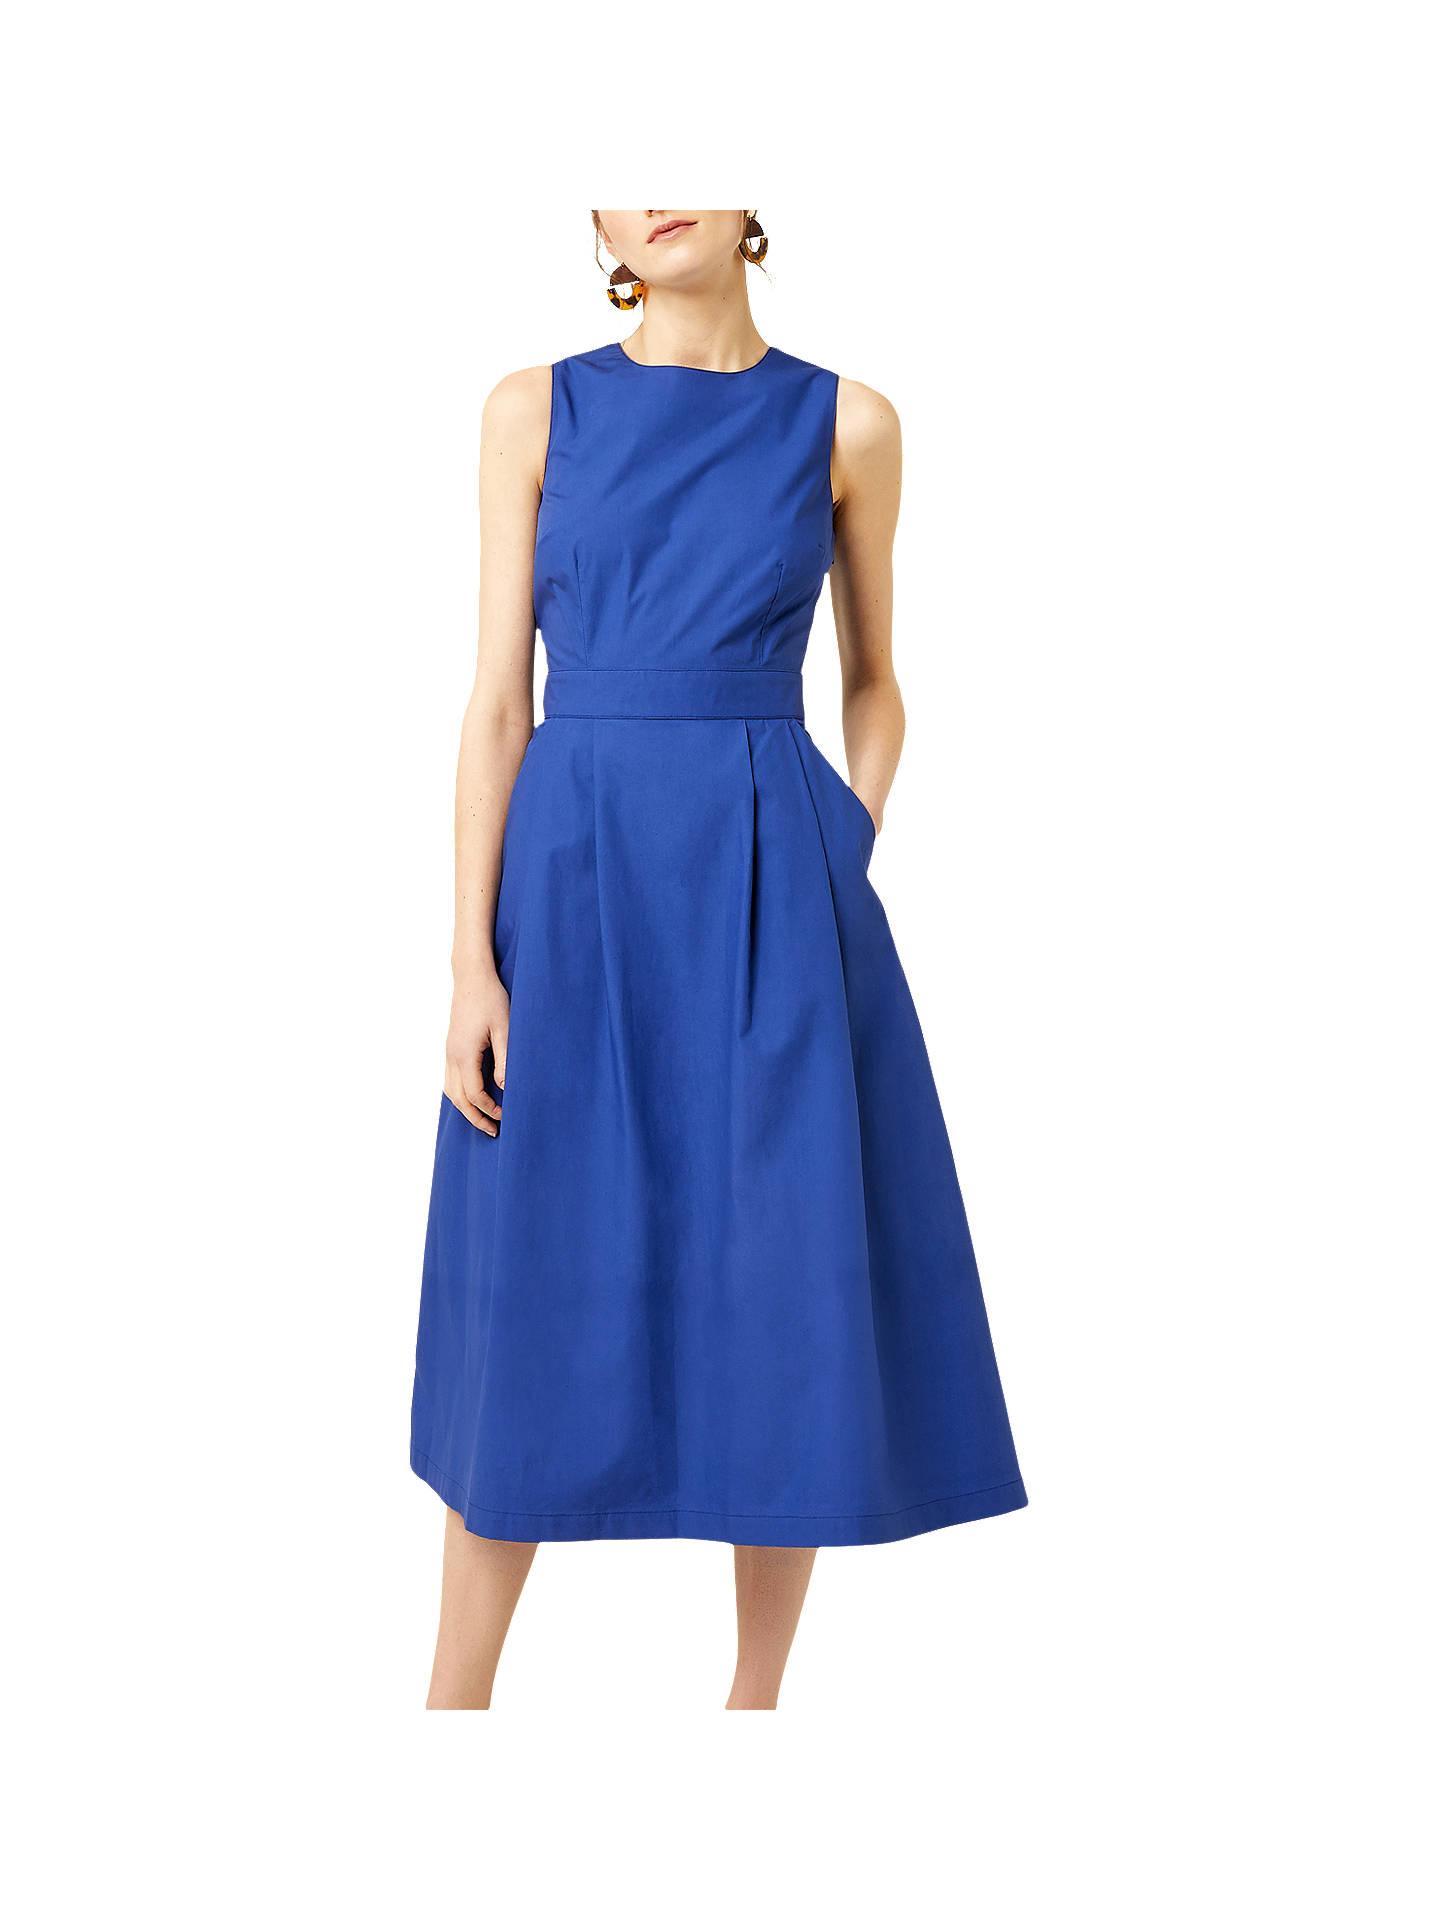 d21524ec3df7 Buy Warehouse Cotton Tie Back Midi Dress, Bright Blue, 6 Online at  johnlewis.